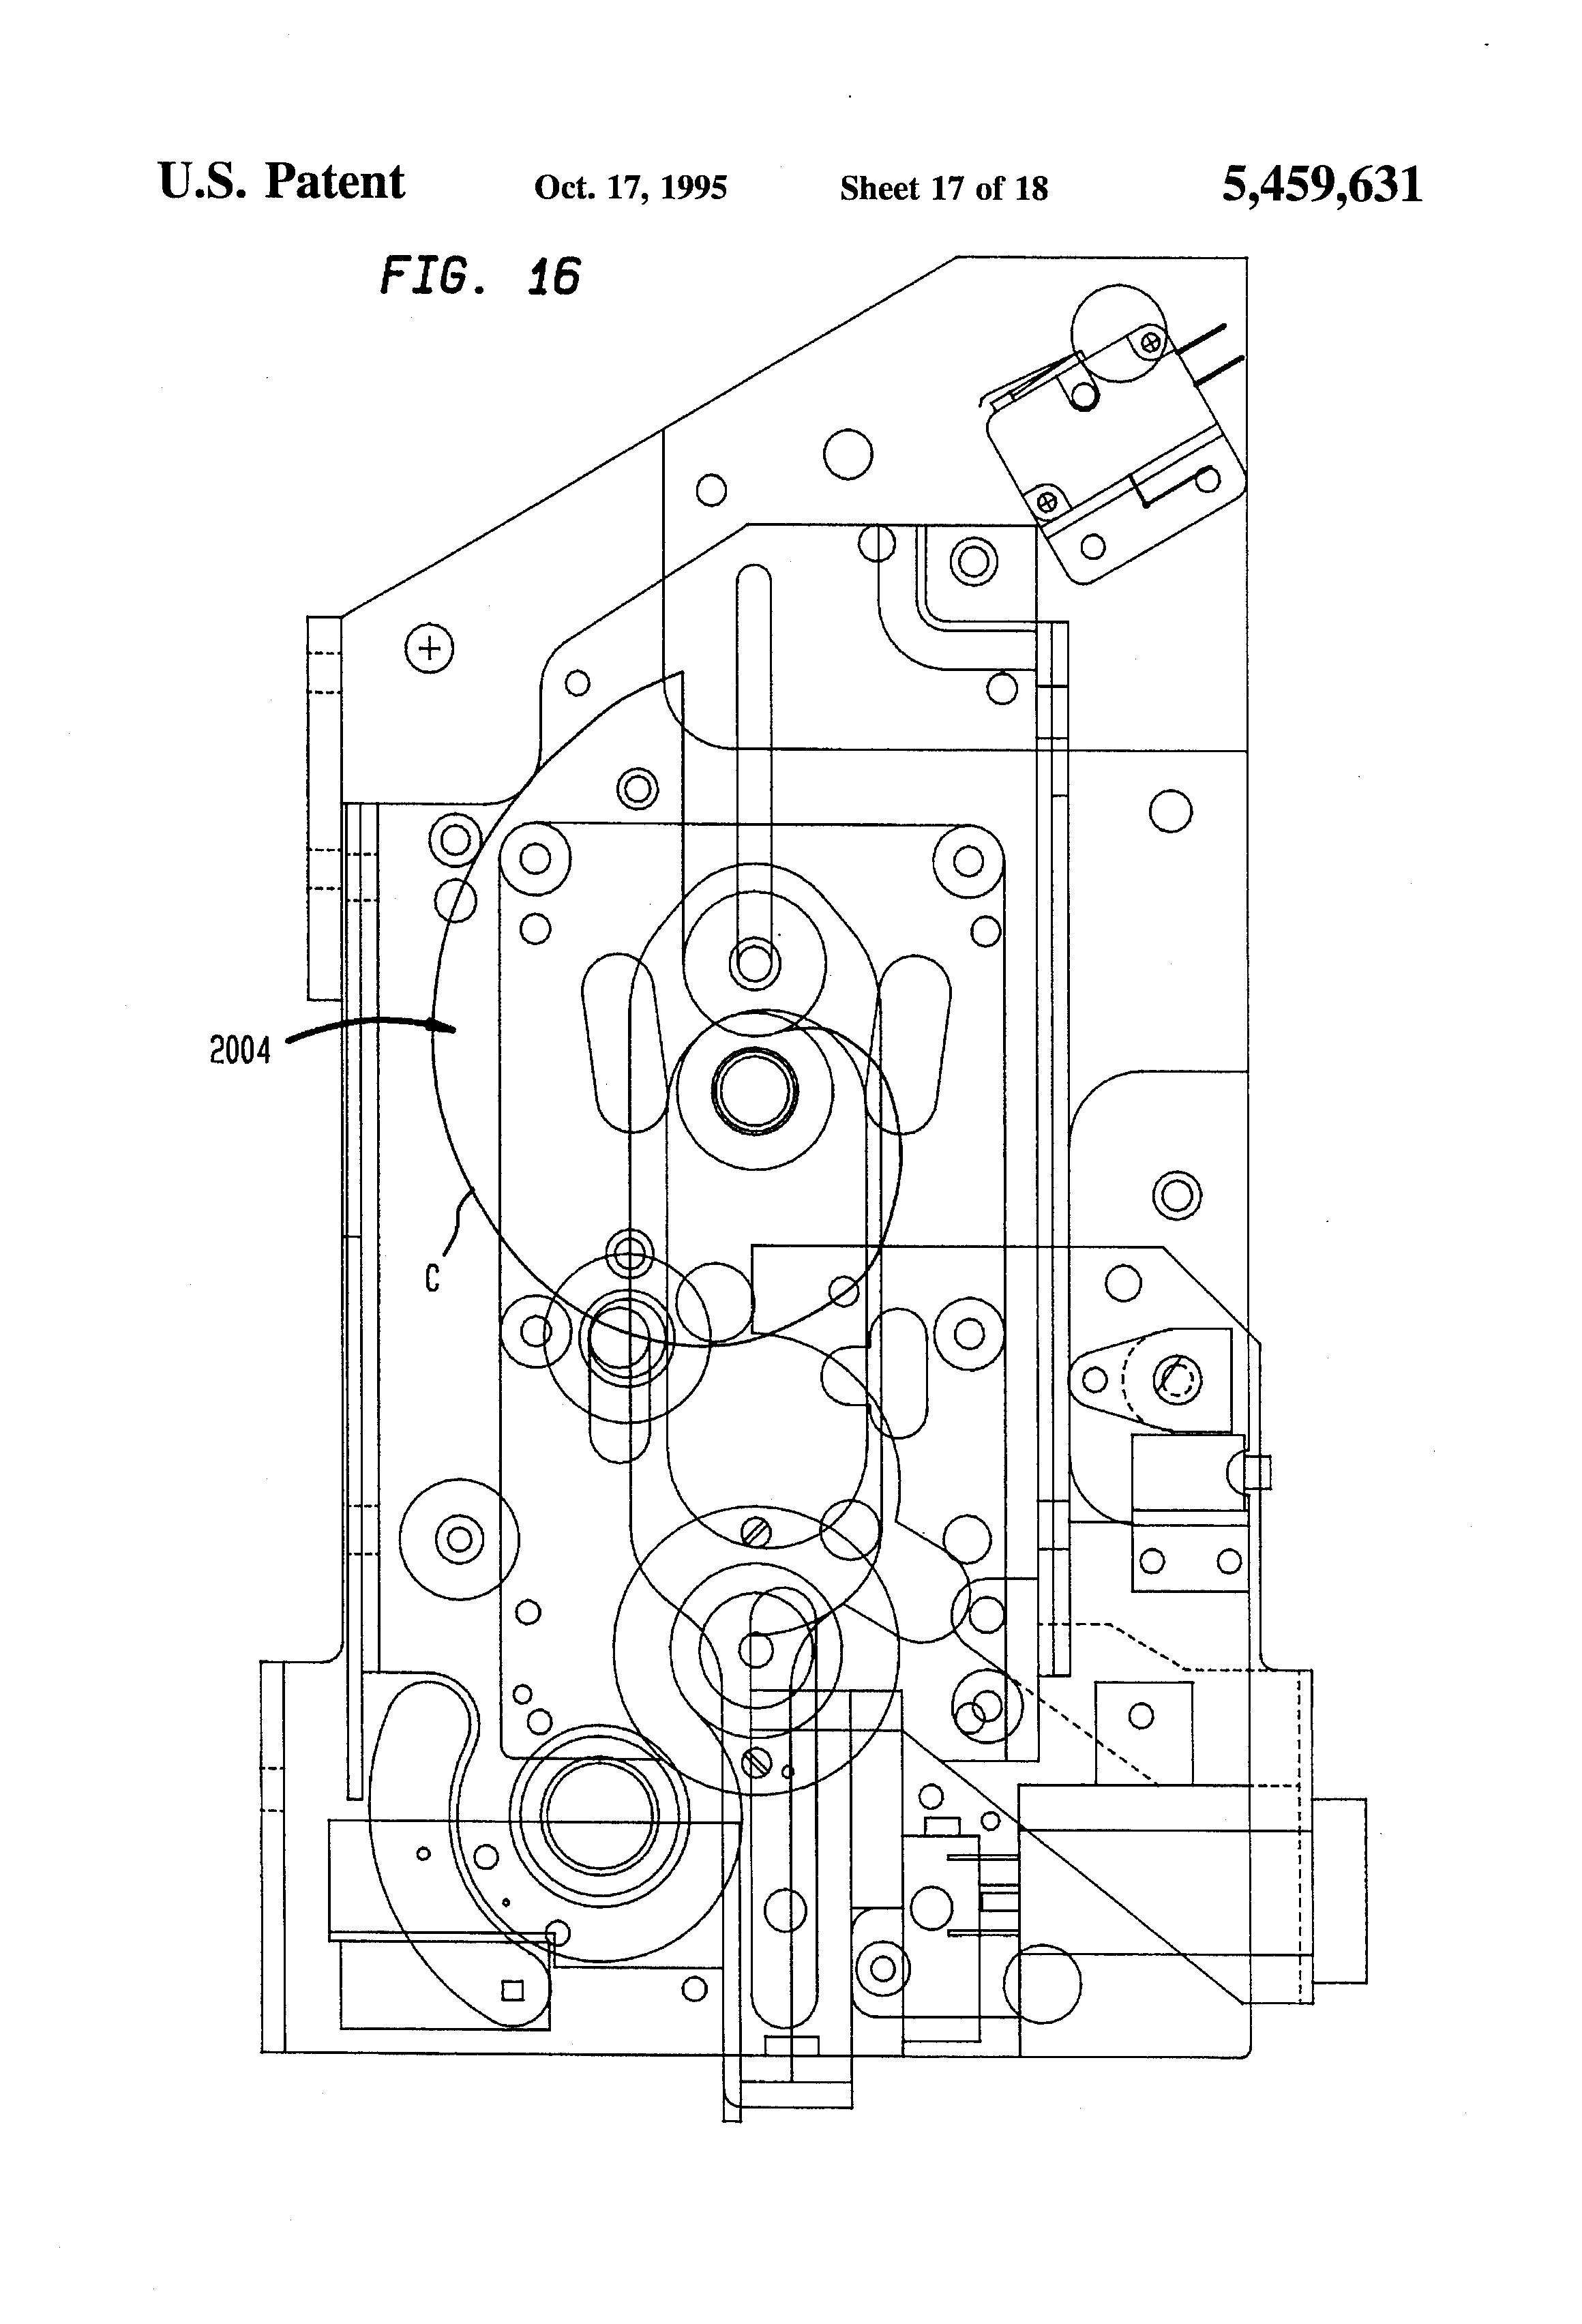 Wiring Diagram For 1210 David Brown David Brown Hydraulic ... on